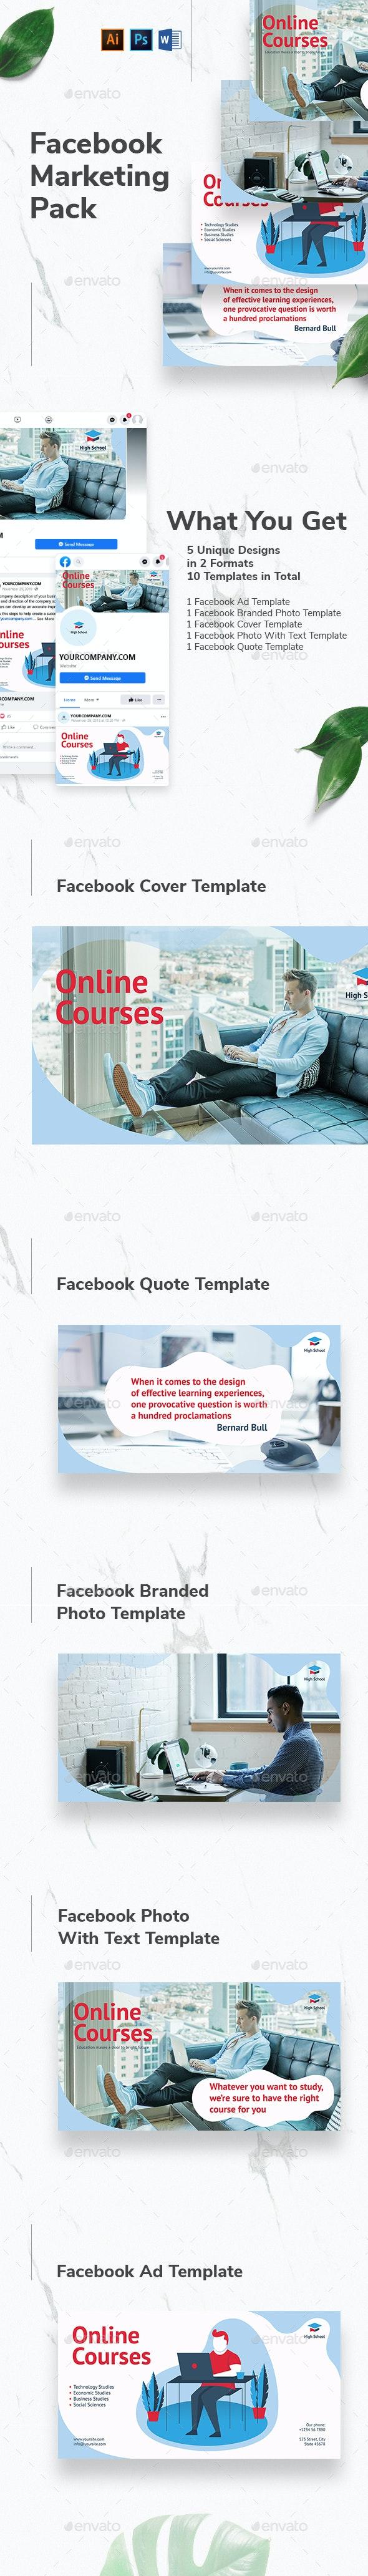 Online Courses Facebook Marketing Materials - Facebook Timeline Covers Social Media